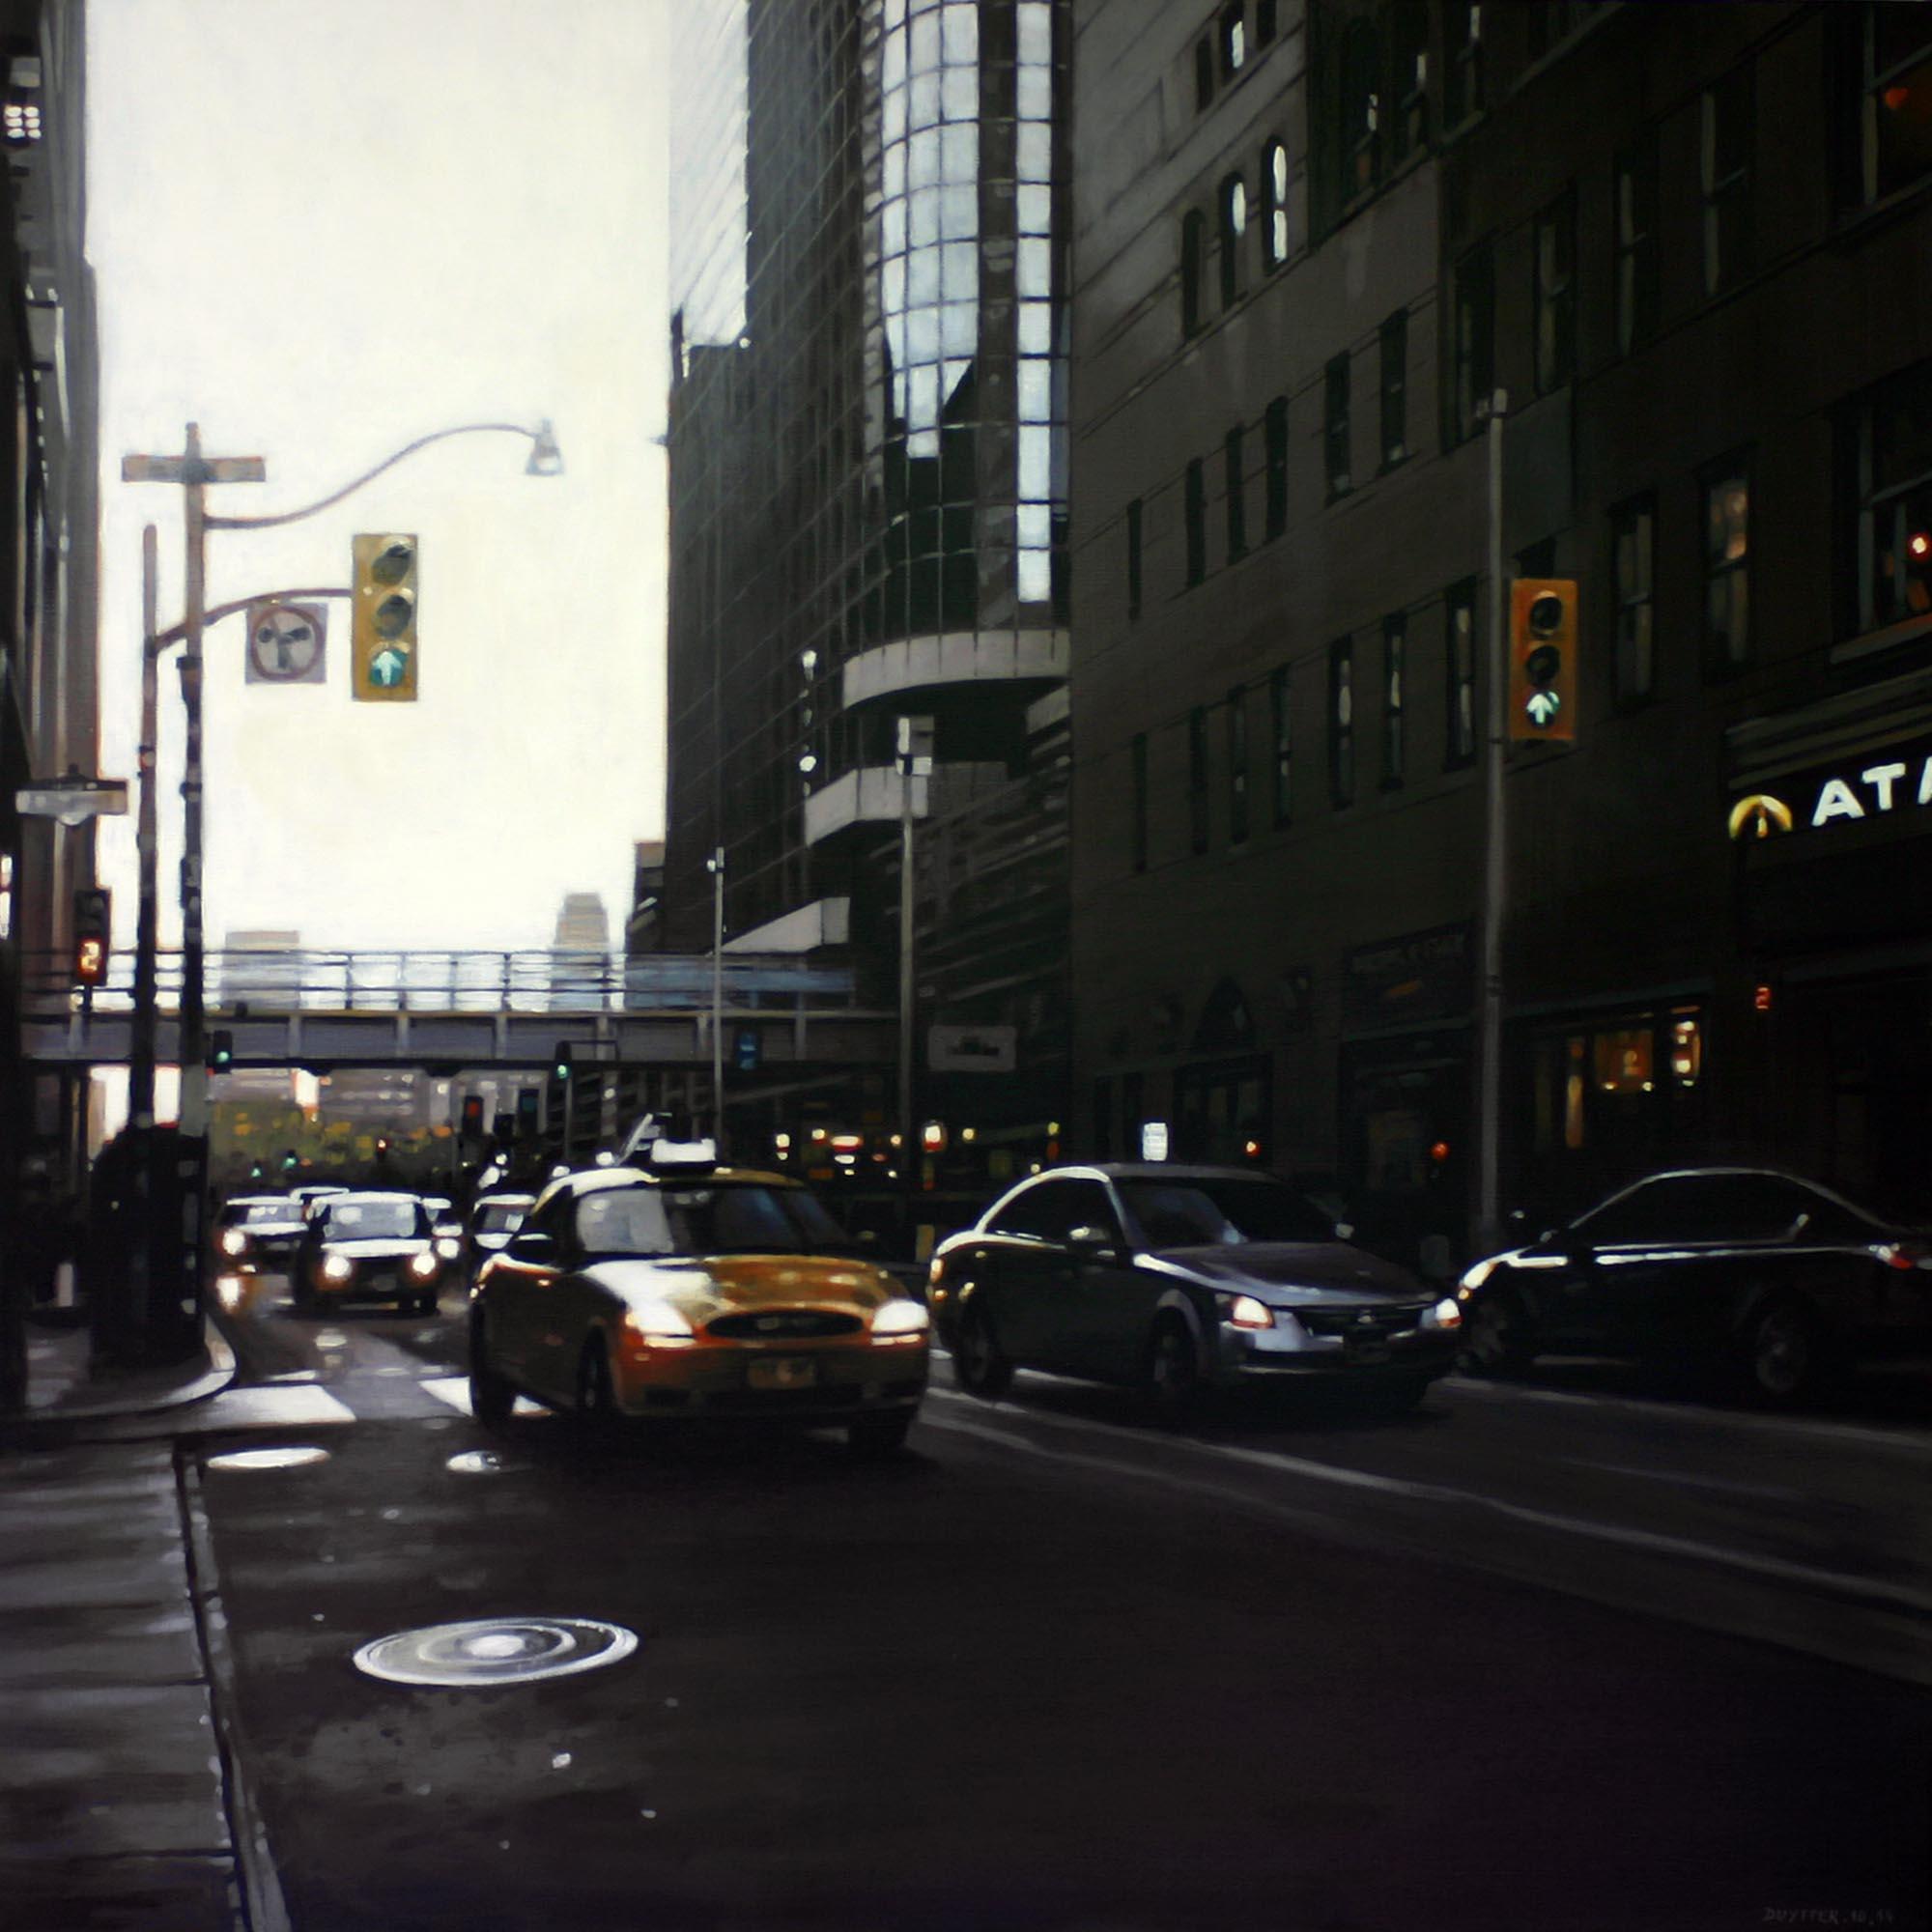 Toronto Taxi.jpg